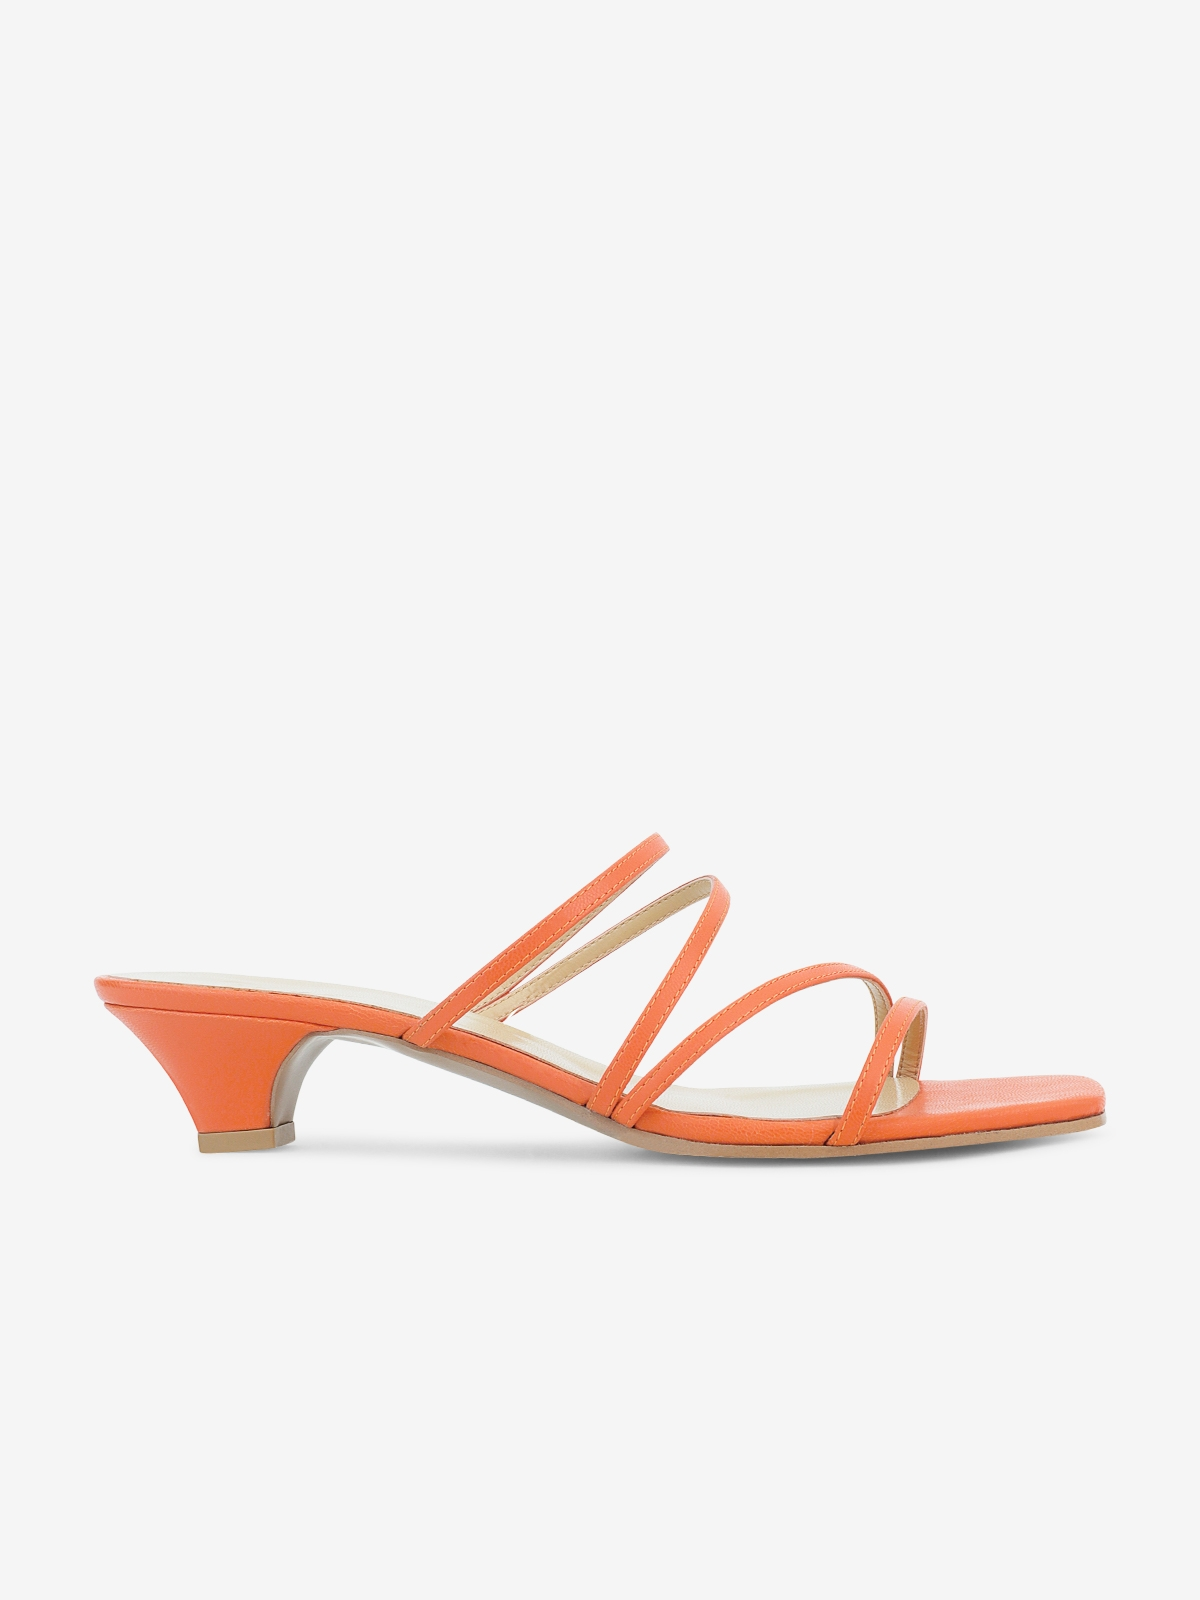 Philia Boutique P05 Kitten Heels Orange